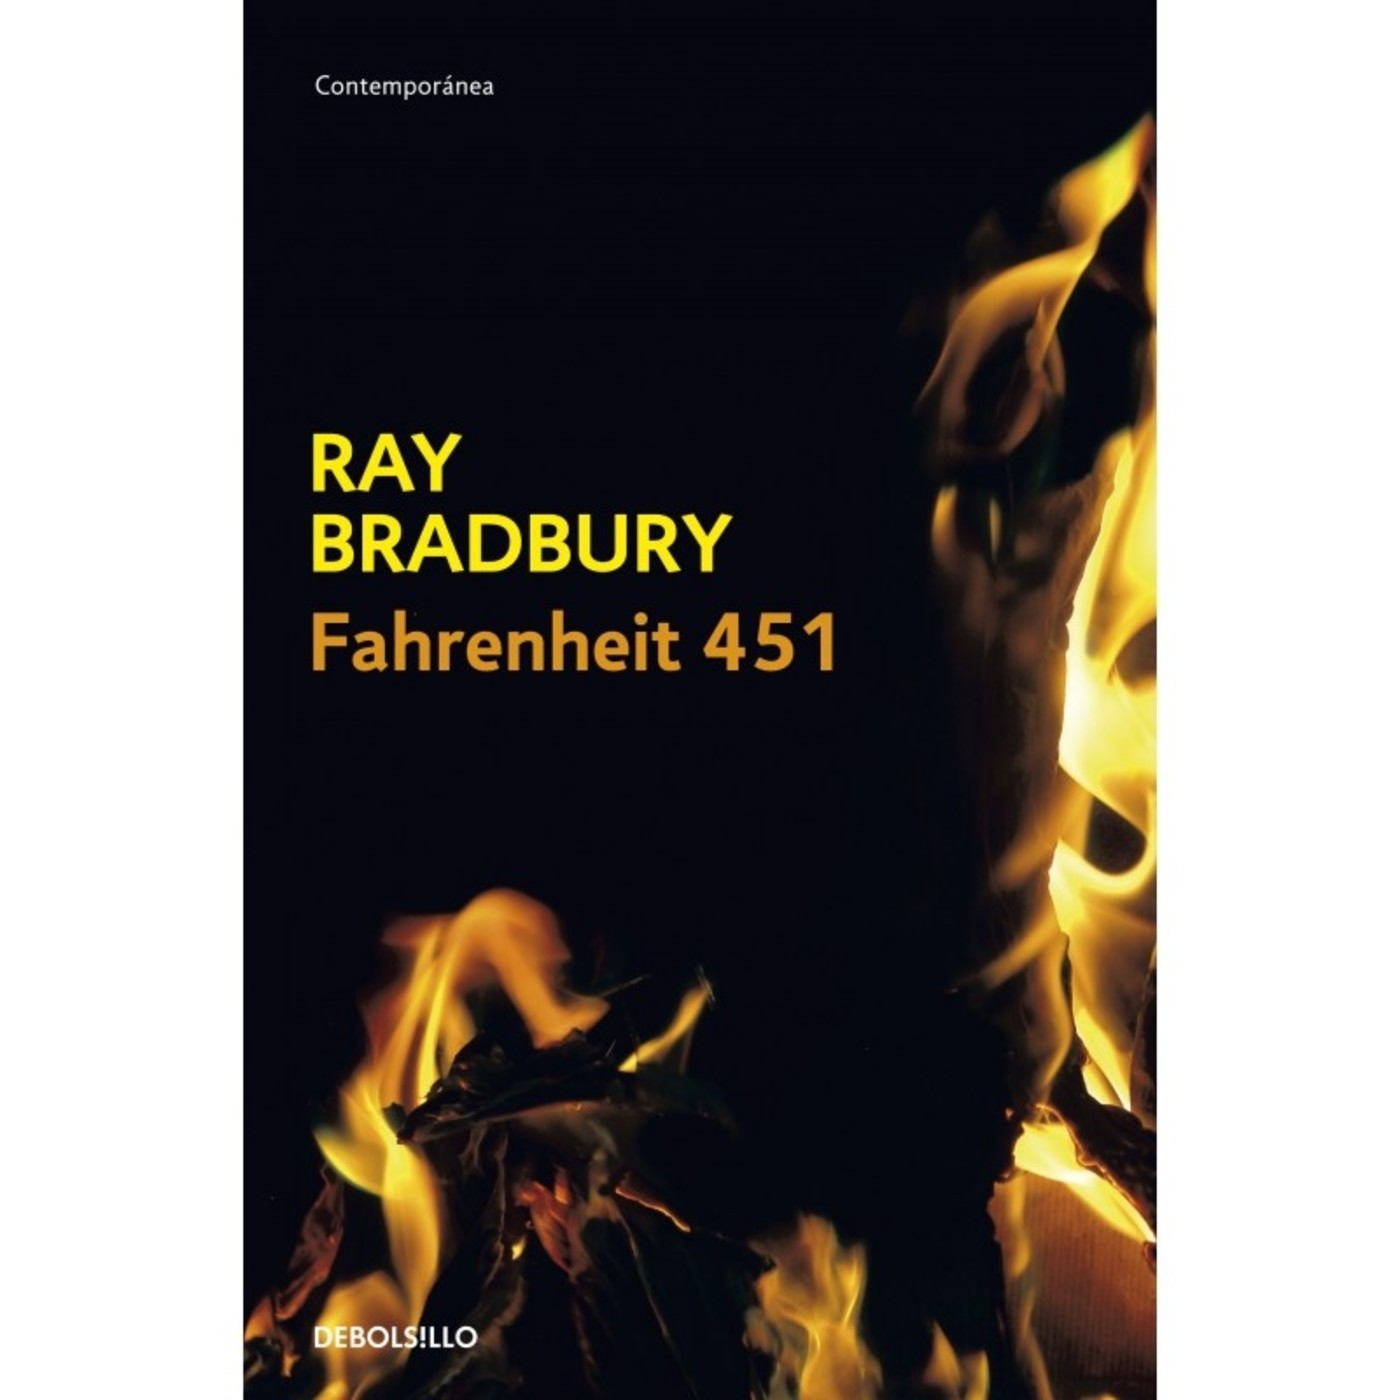 Fahrenheit 451 Ray Bradbury 1 9 Voz Humana En Fahrenheit 451 En Mp3 12 08 A Las 07 11 50 35 30 12520315 Ivoox